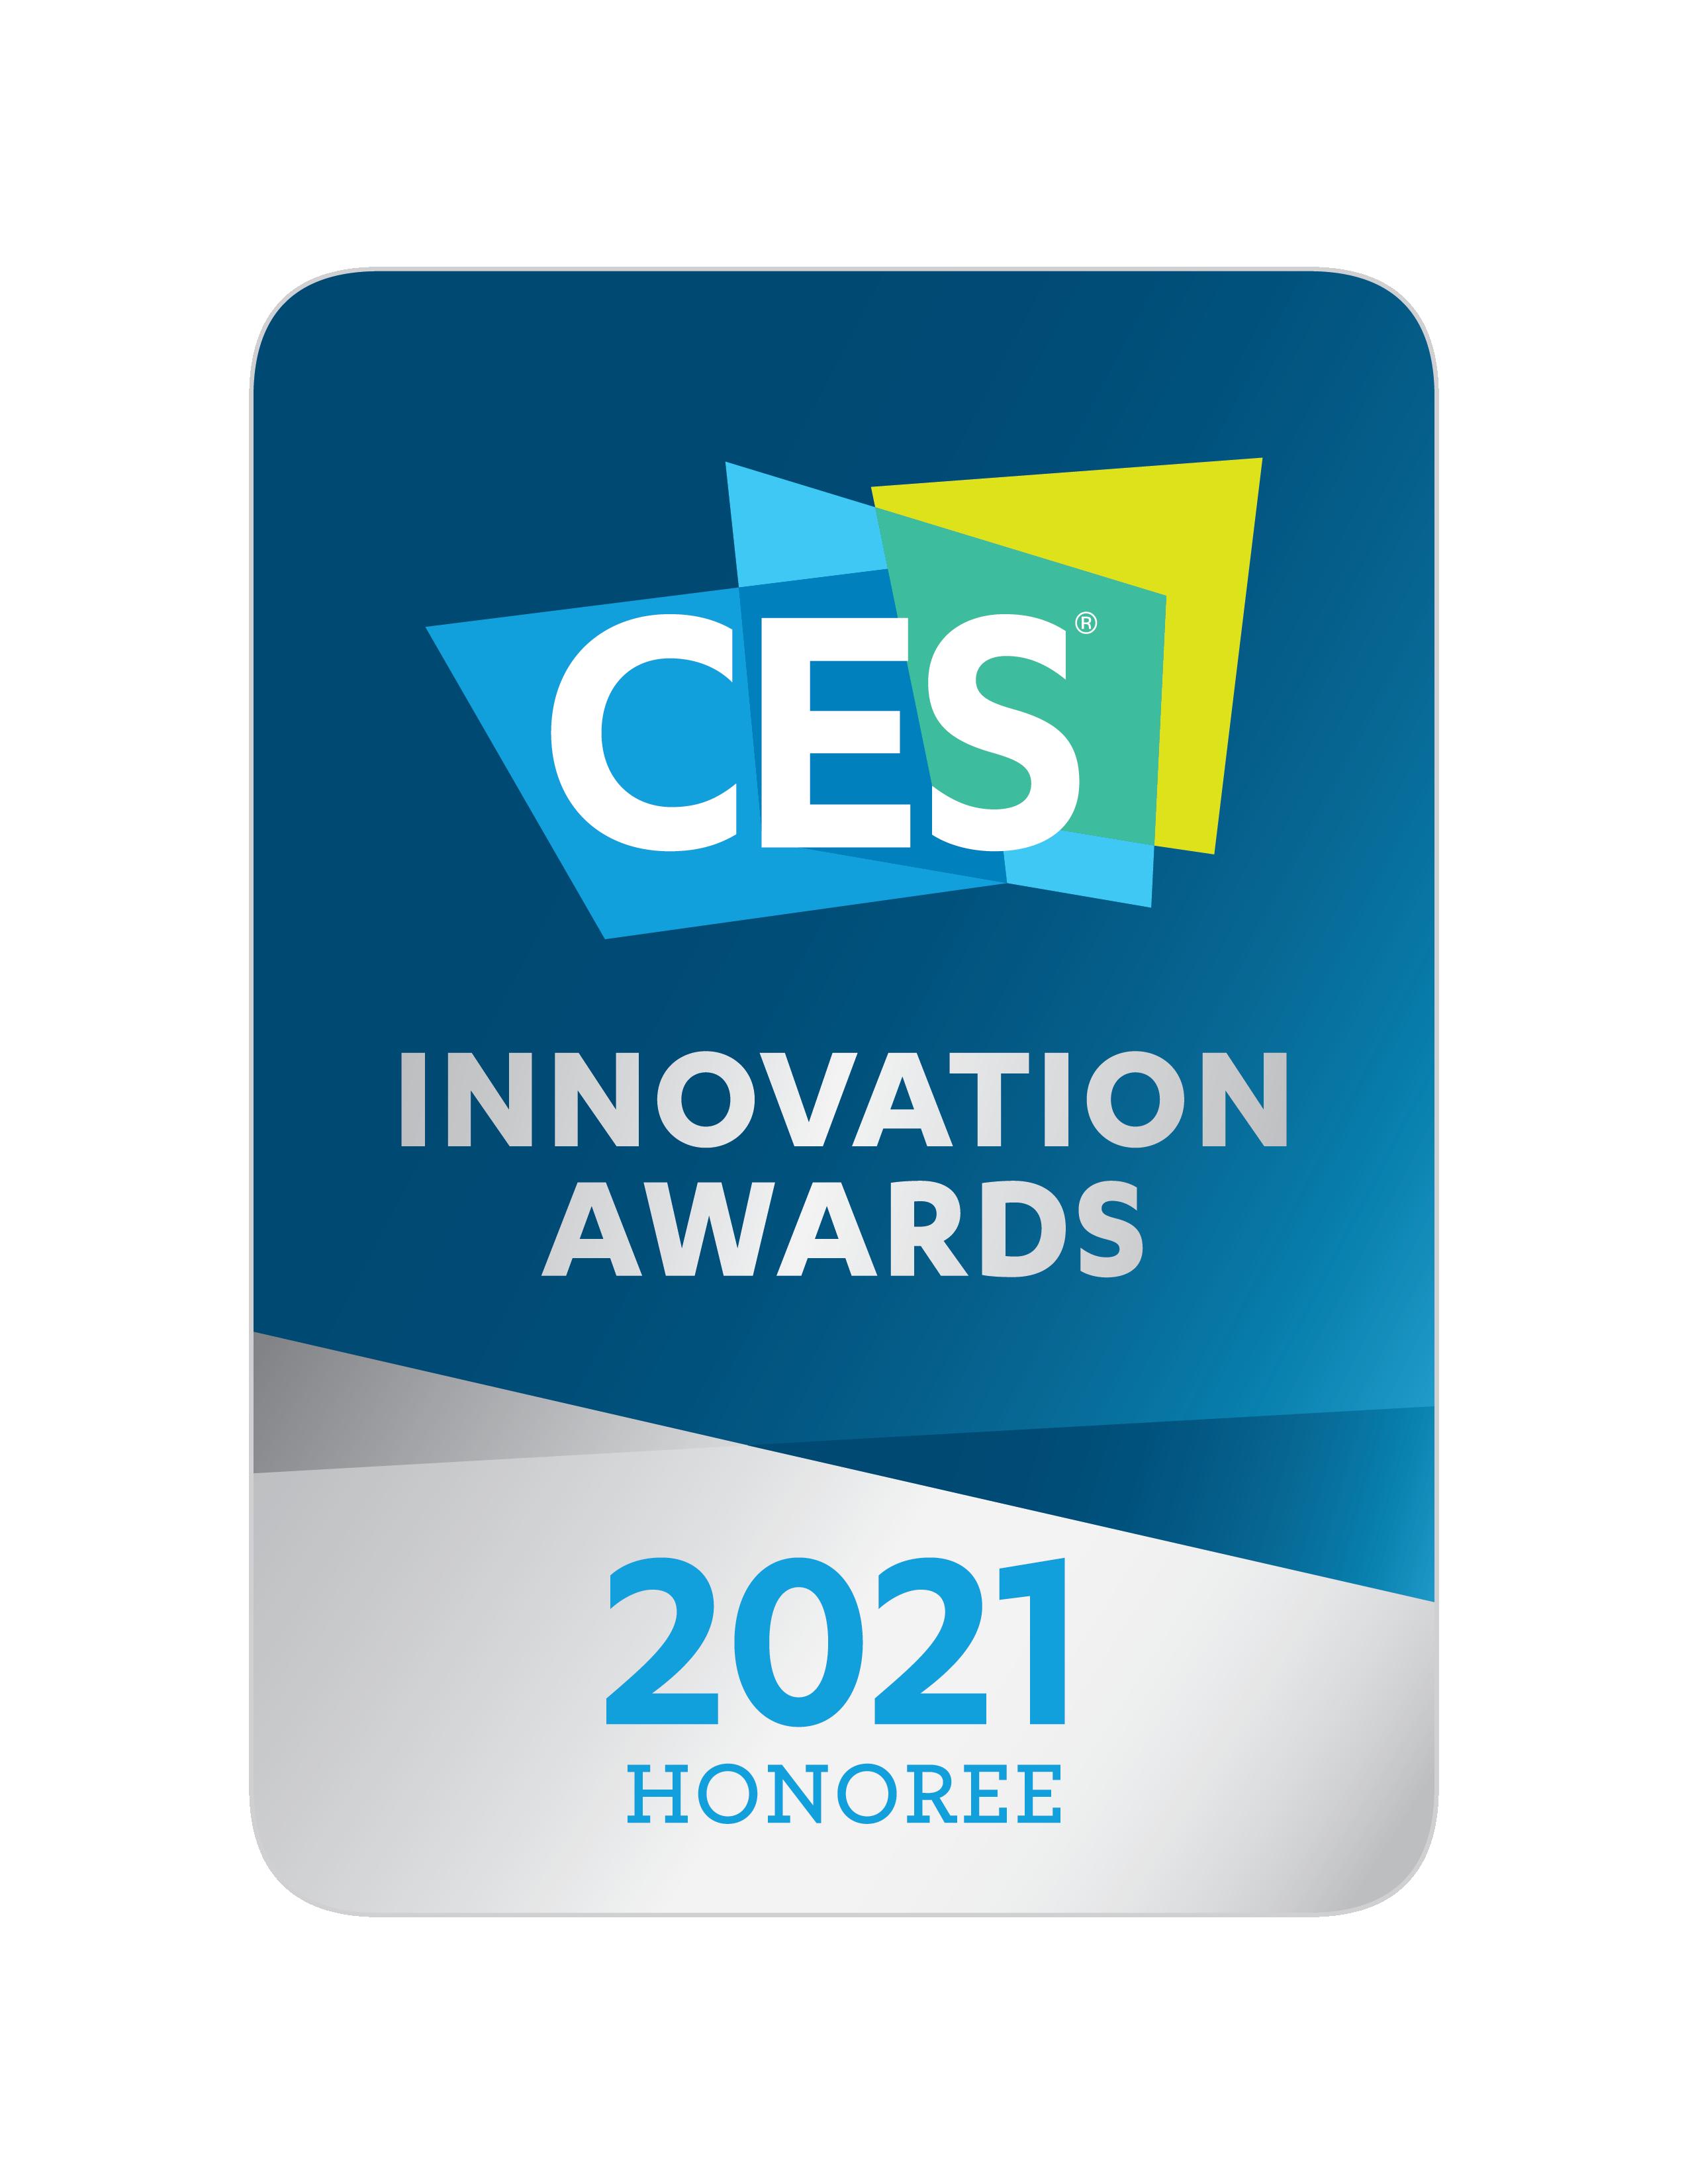 ces2021 innovationawardshonoree png